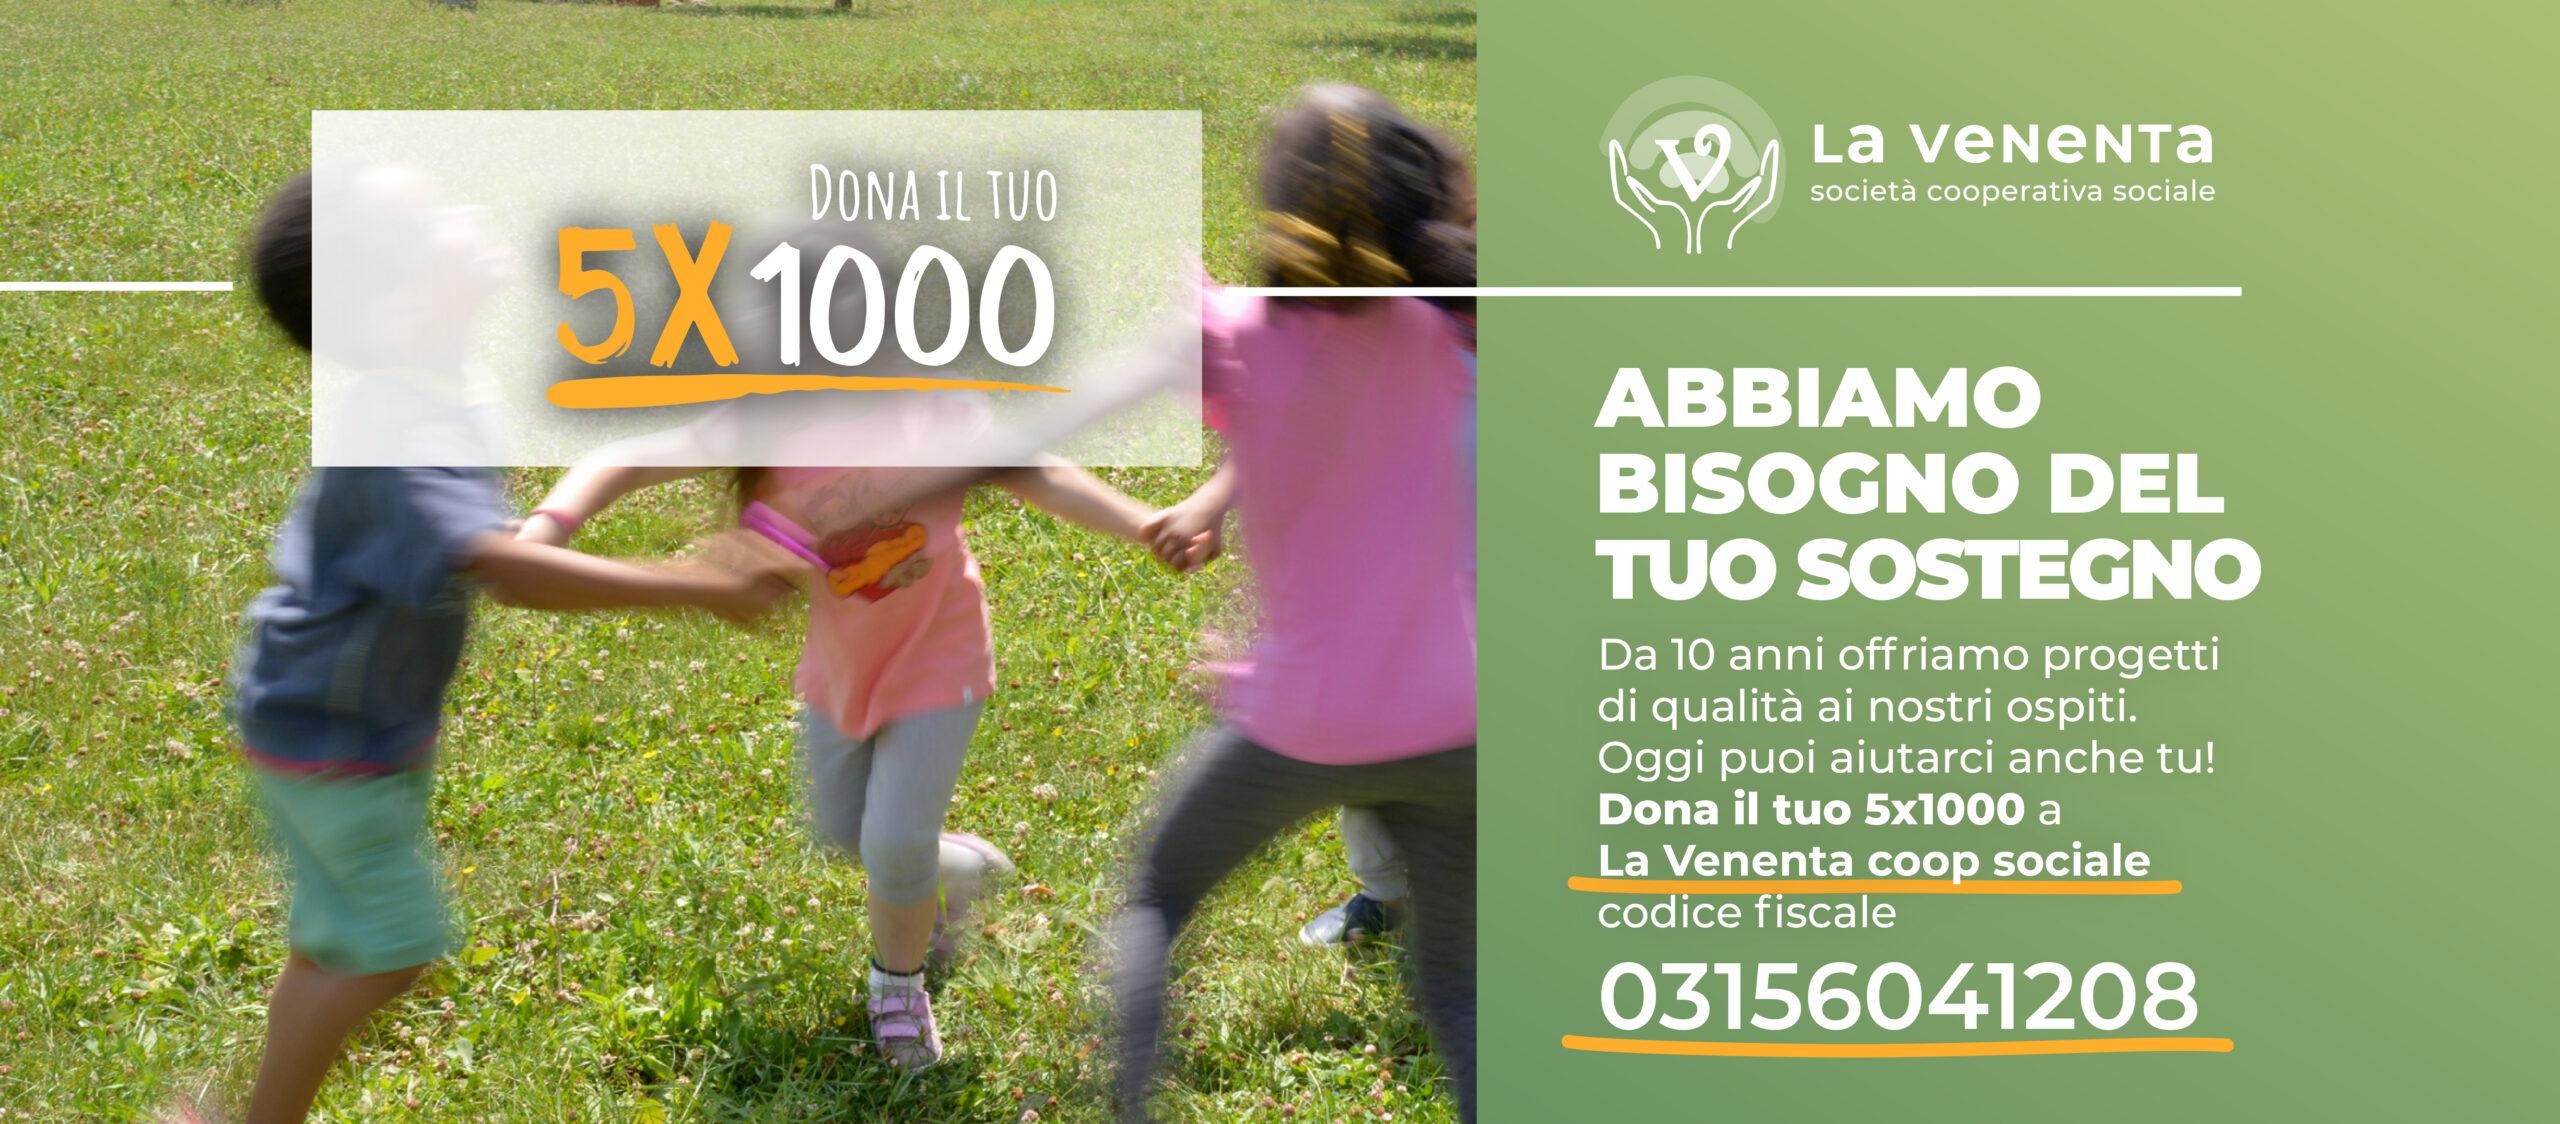 Dona il tuo 5×1000 a coop sociale La Venenta